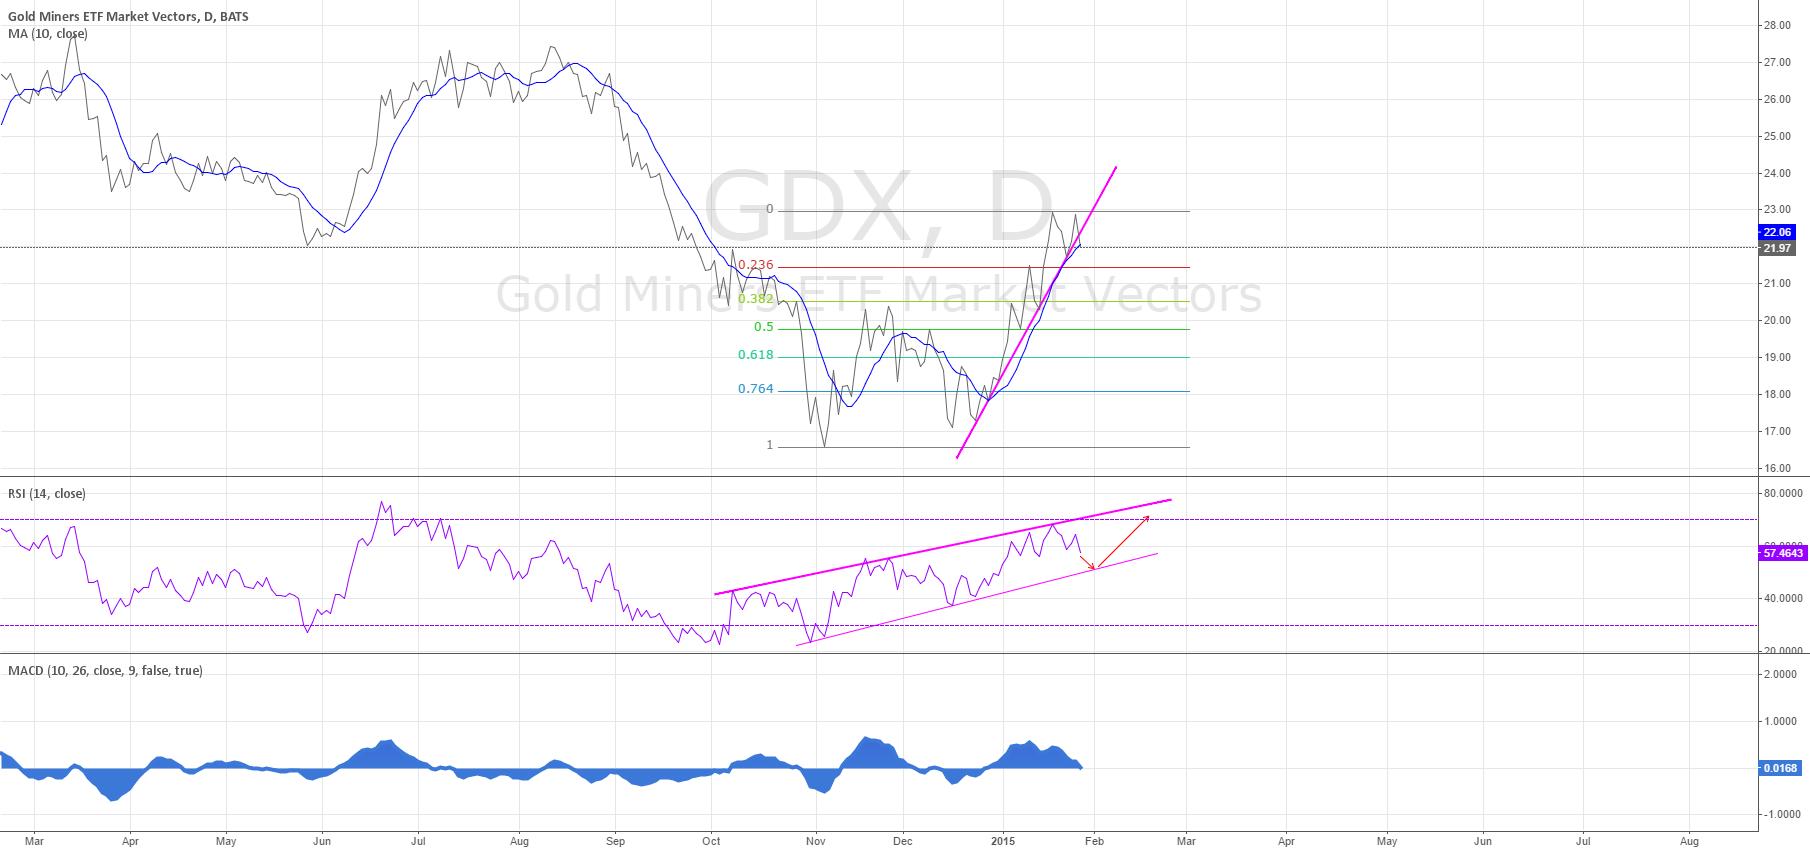 GDX update - short term weakness - 1/29/2015